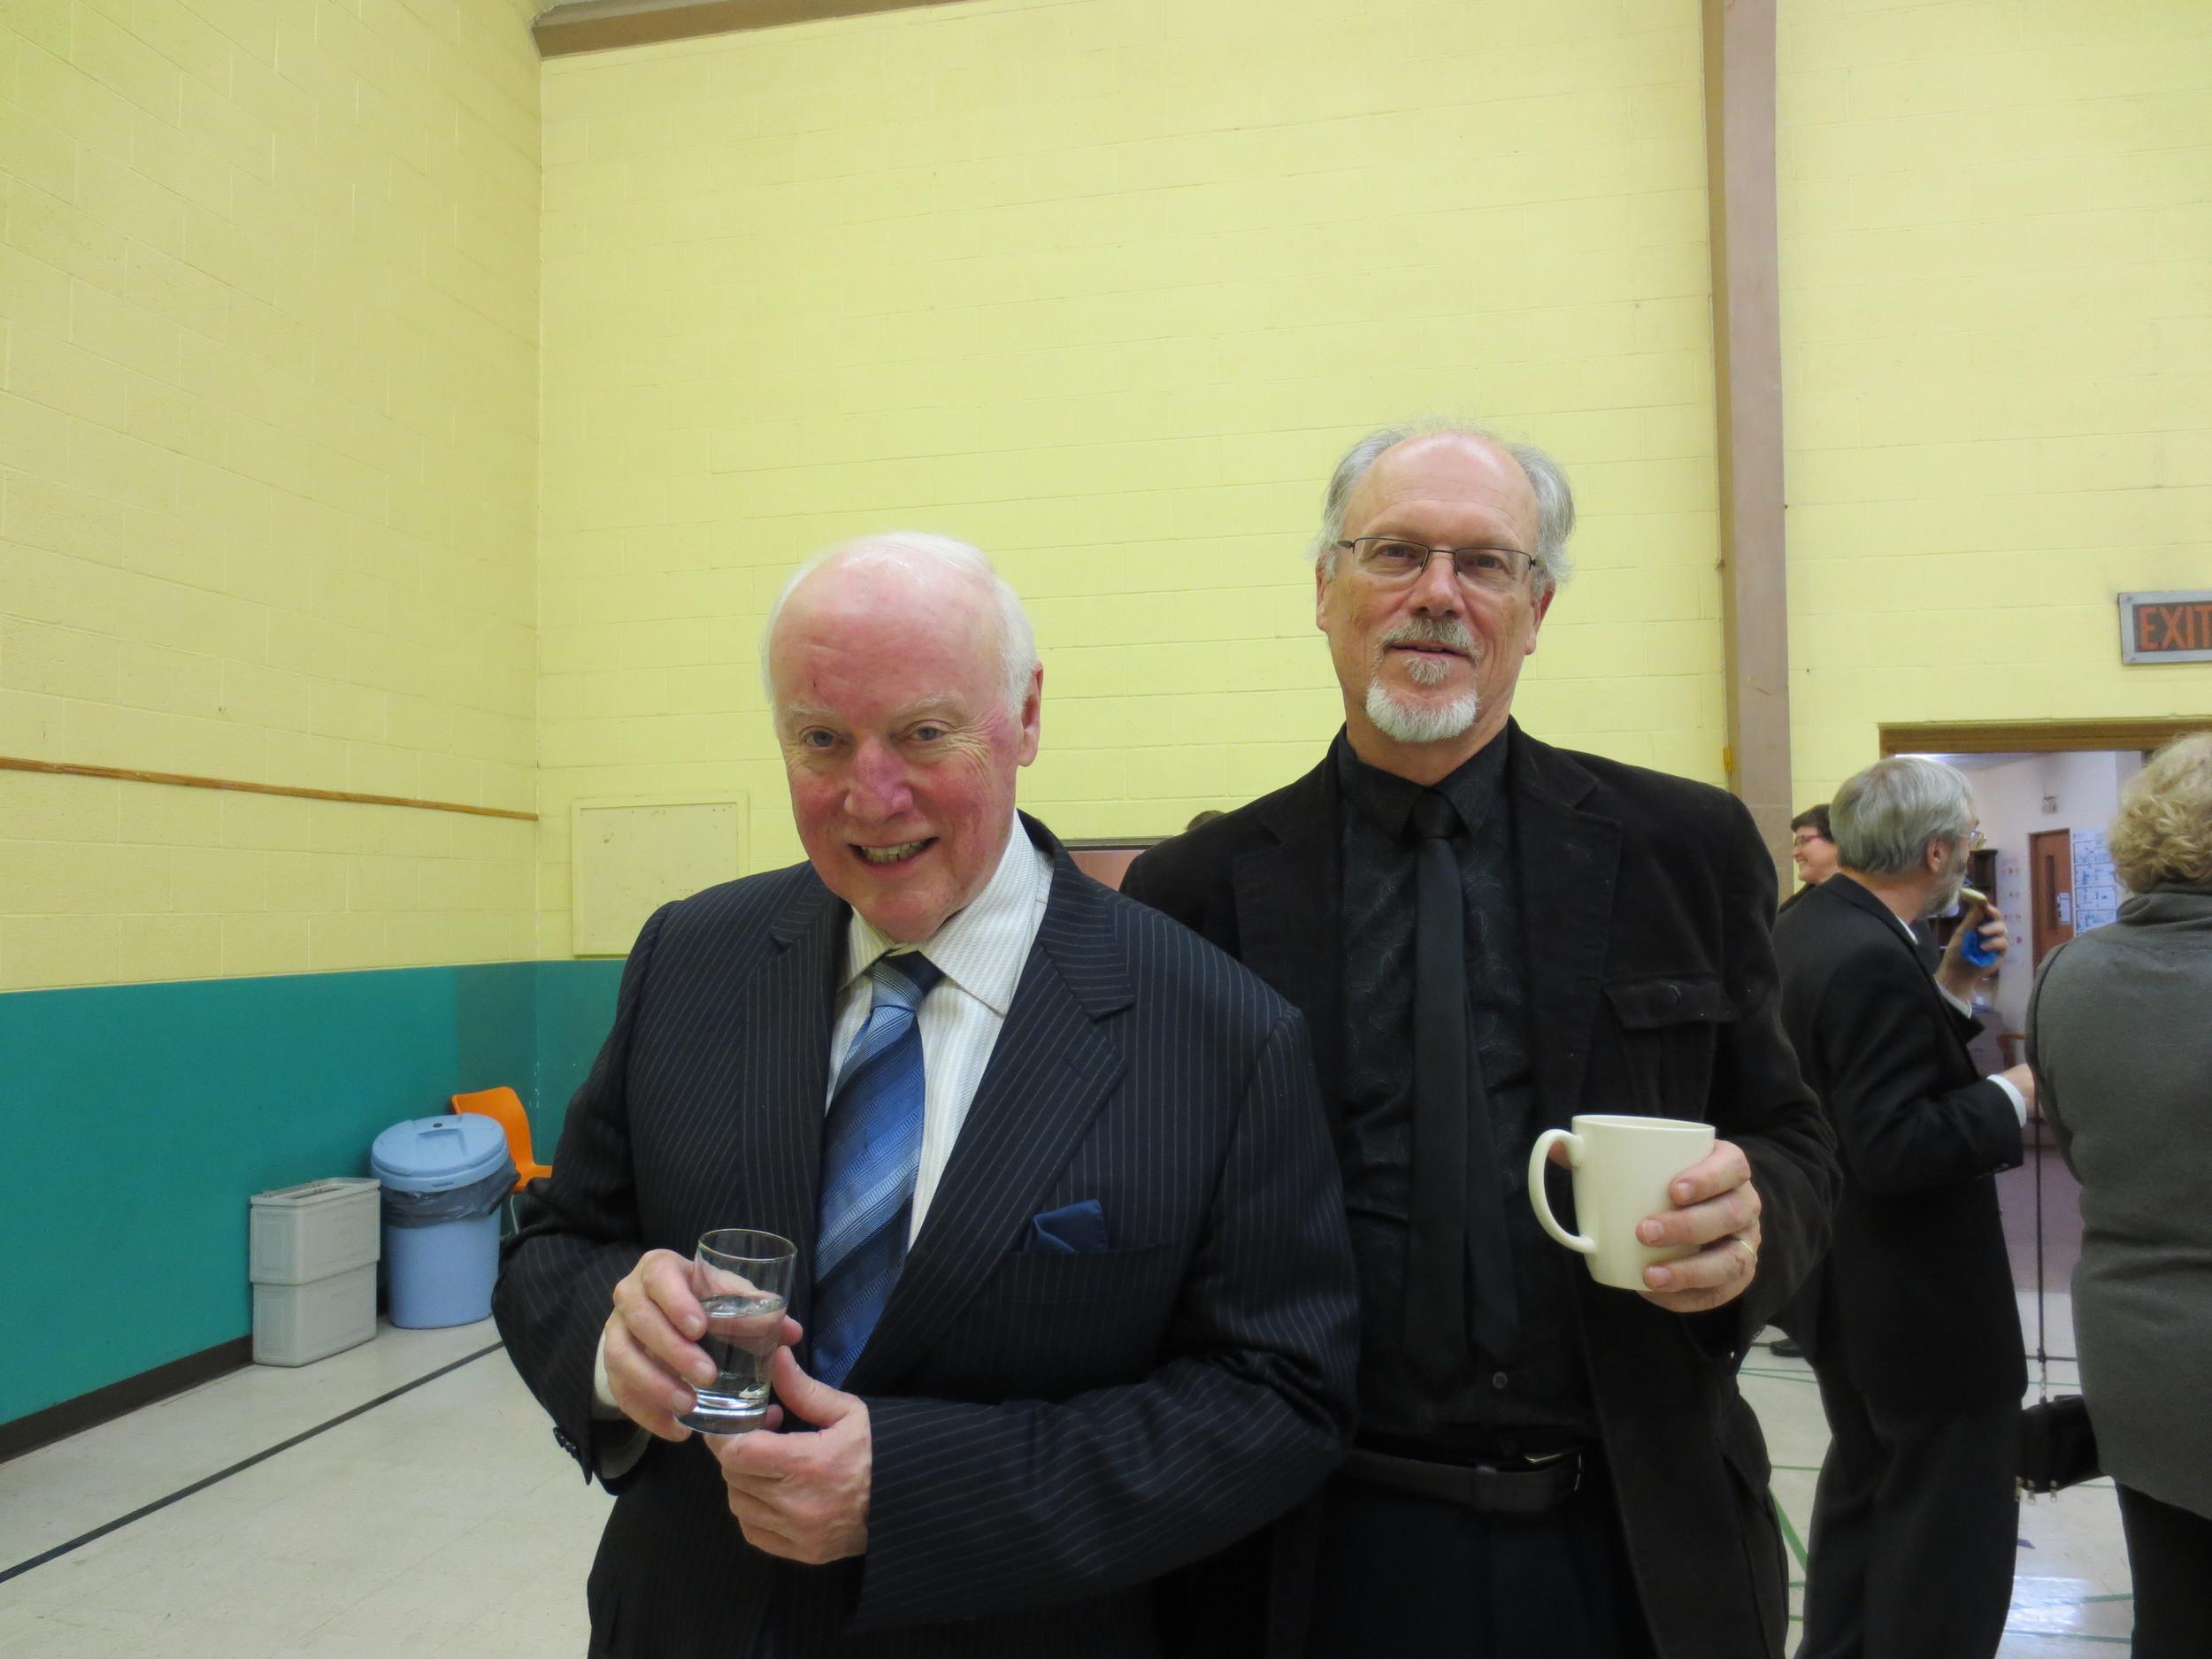 John Grew, Music Professor Emeritus, McGill University, and St. Peter's Music Director, Bradley Moggach.